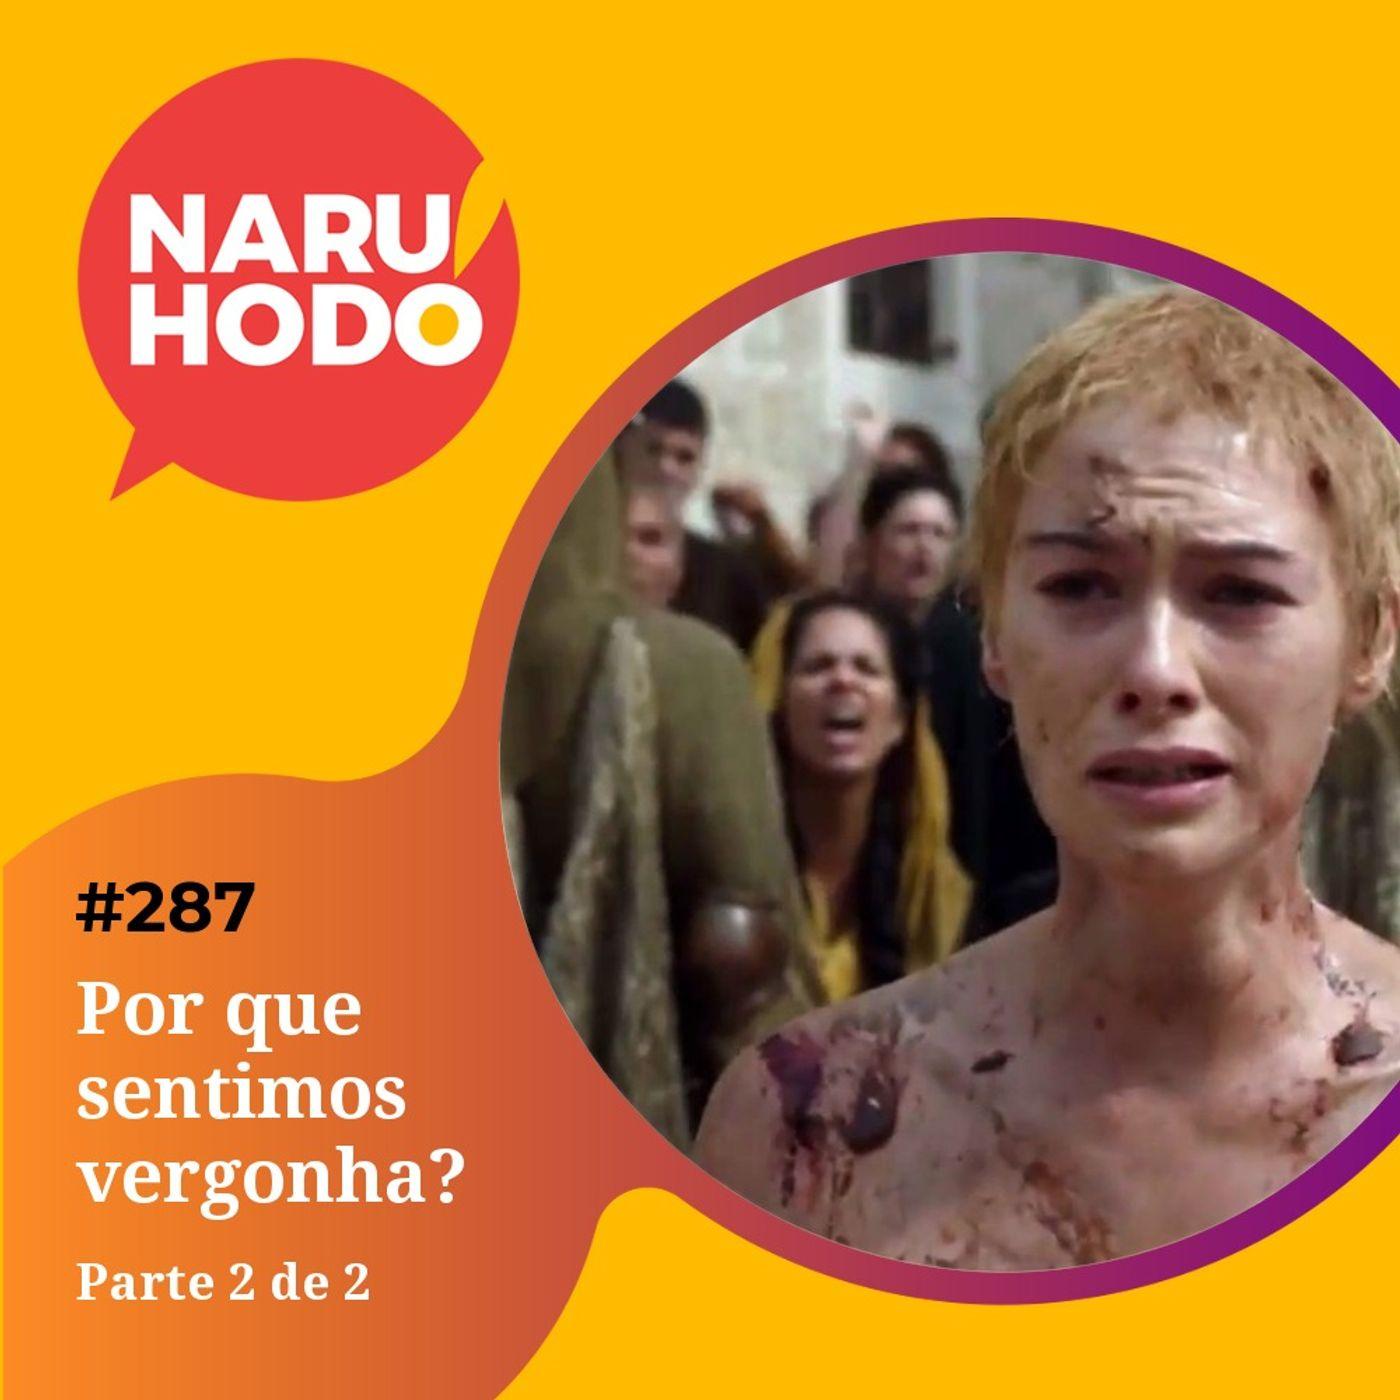 Naruhodo #287 - Por que sentimos vergonha? - Parte 2 de 2